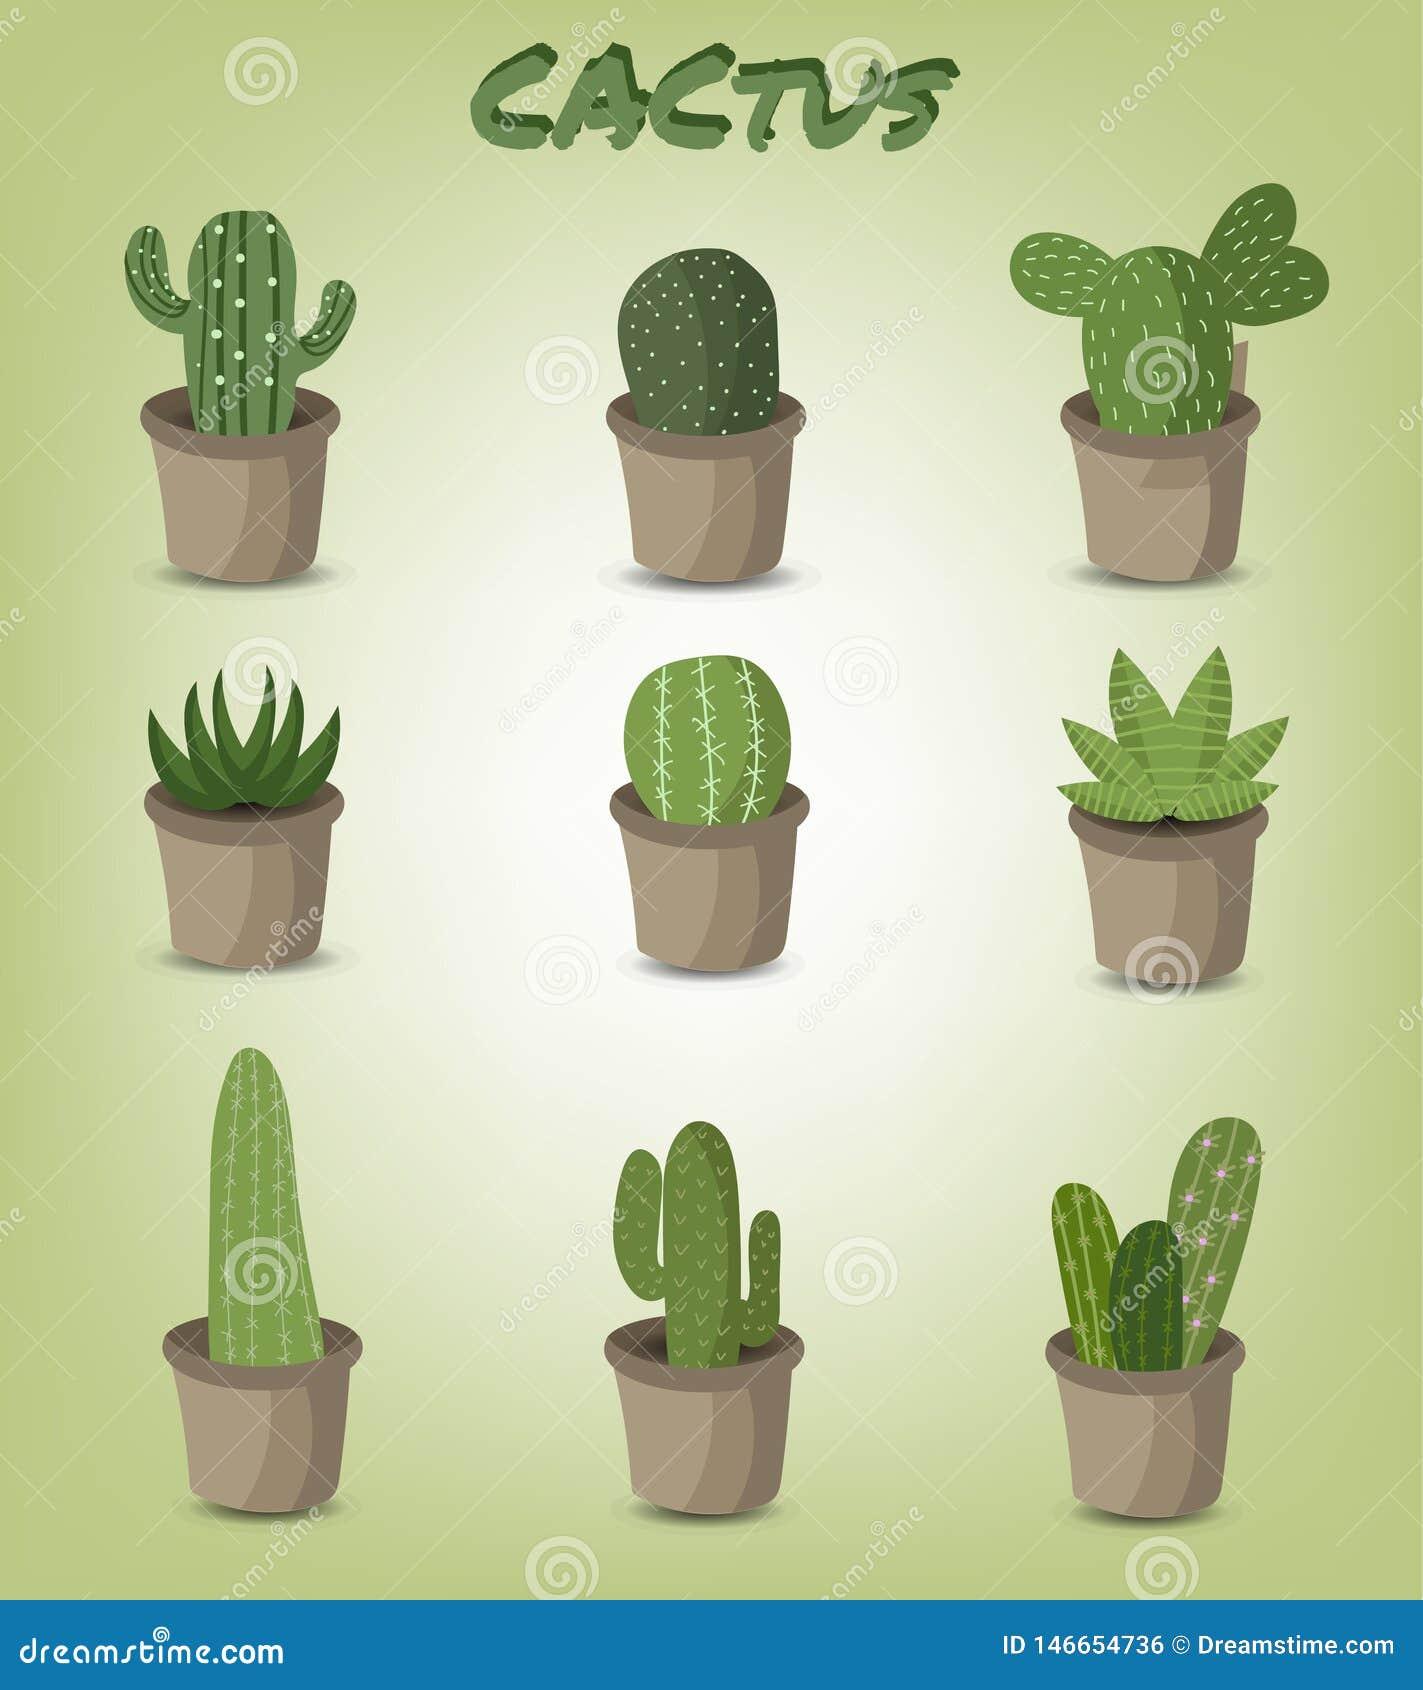 Set of green cactus